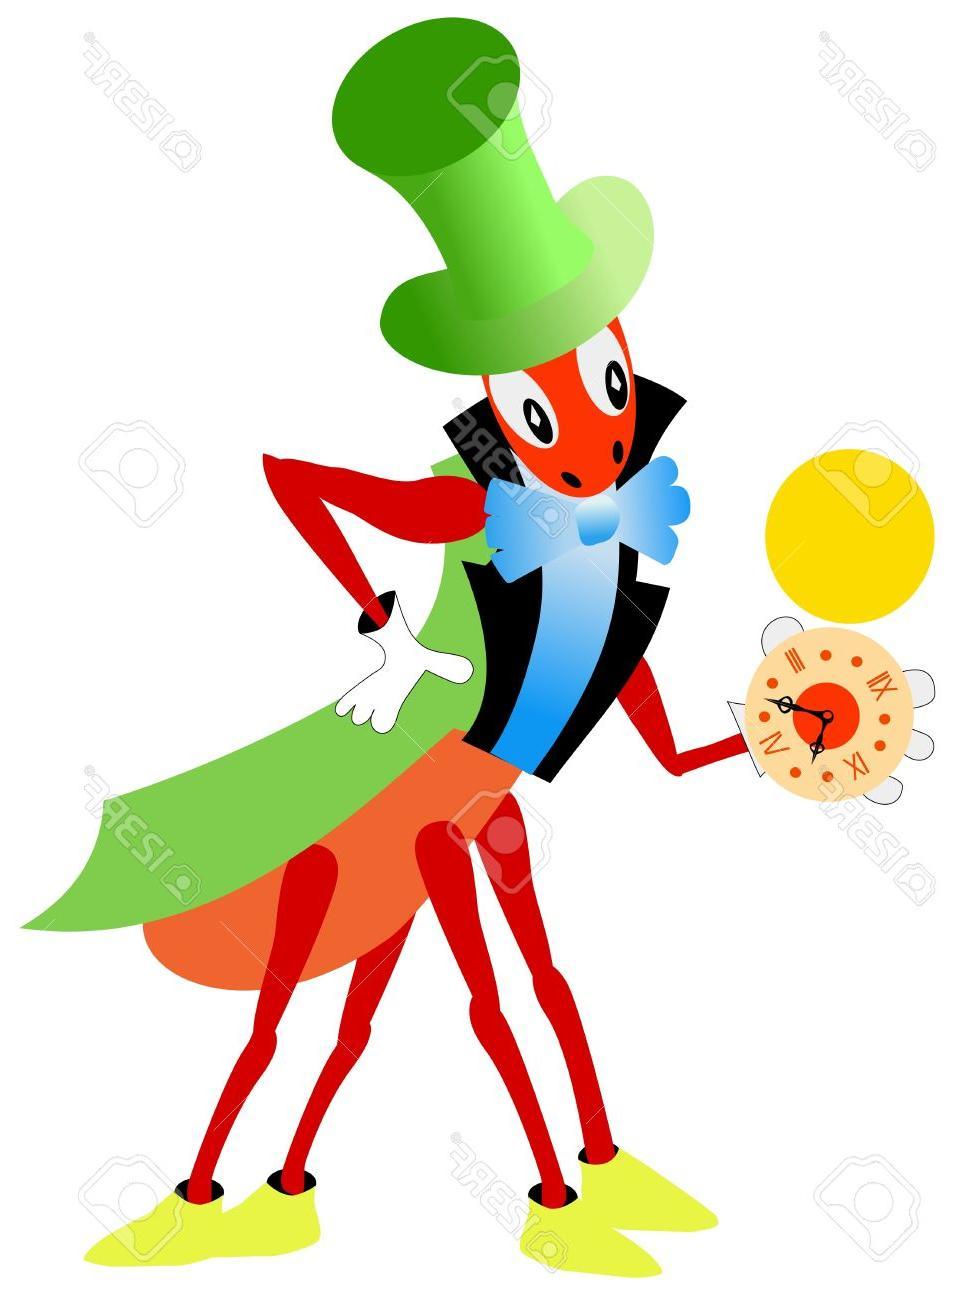 974x1300 Best Hd Cartoon Image Of Fairy Character Cricket Stock Vector